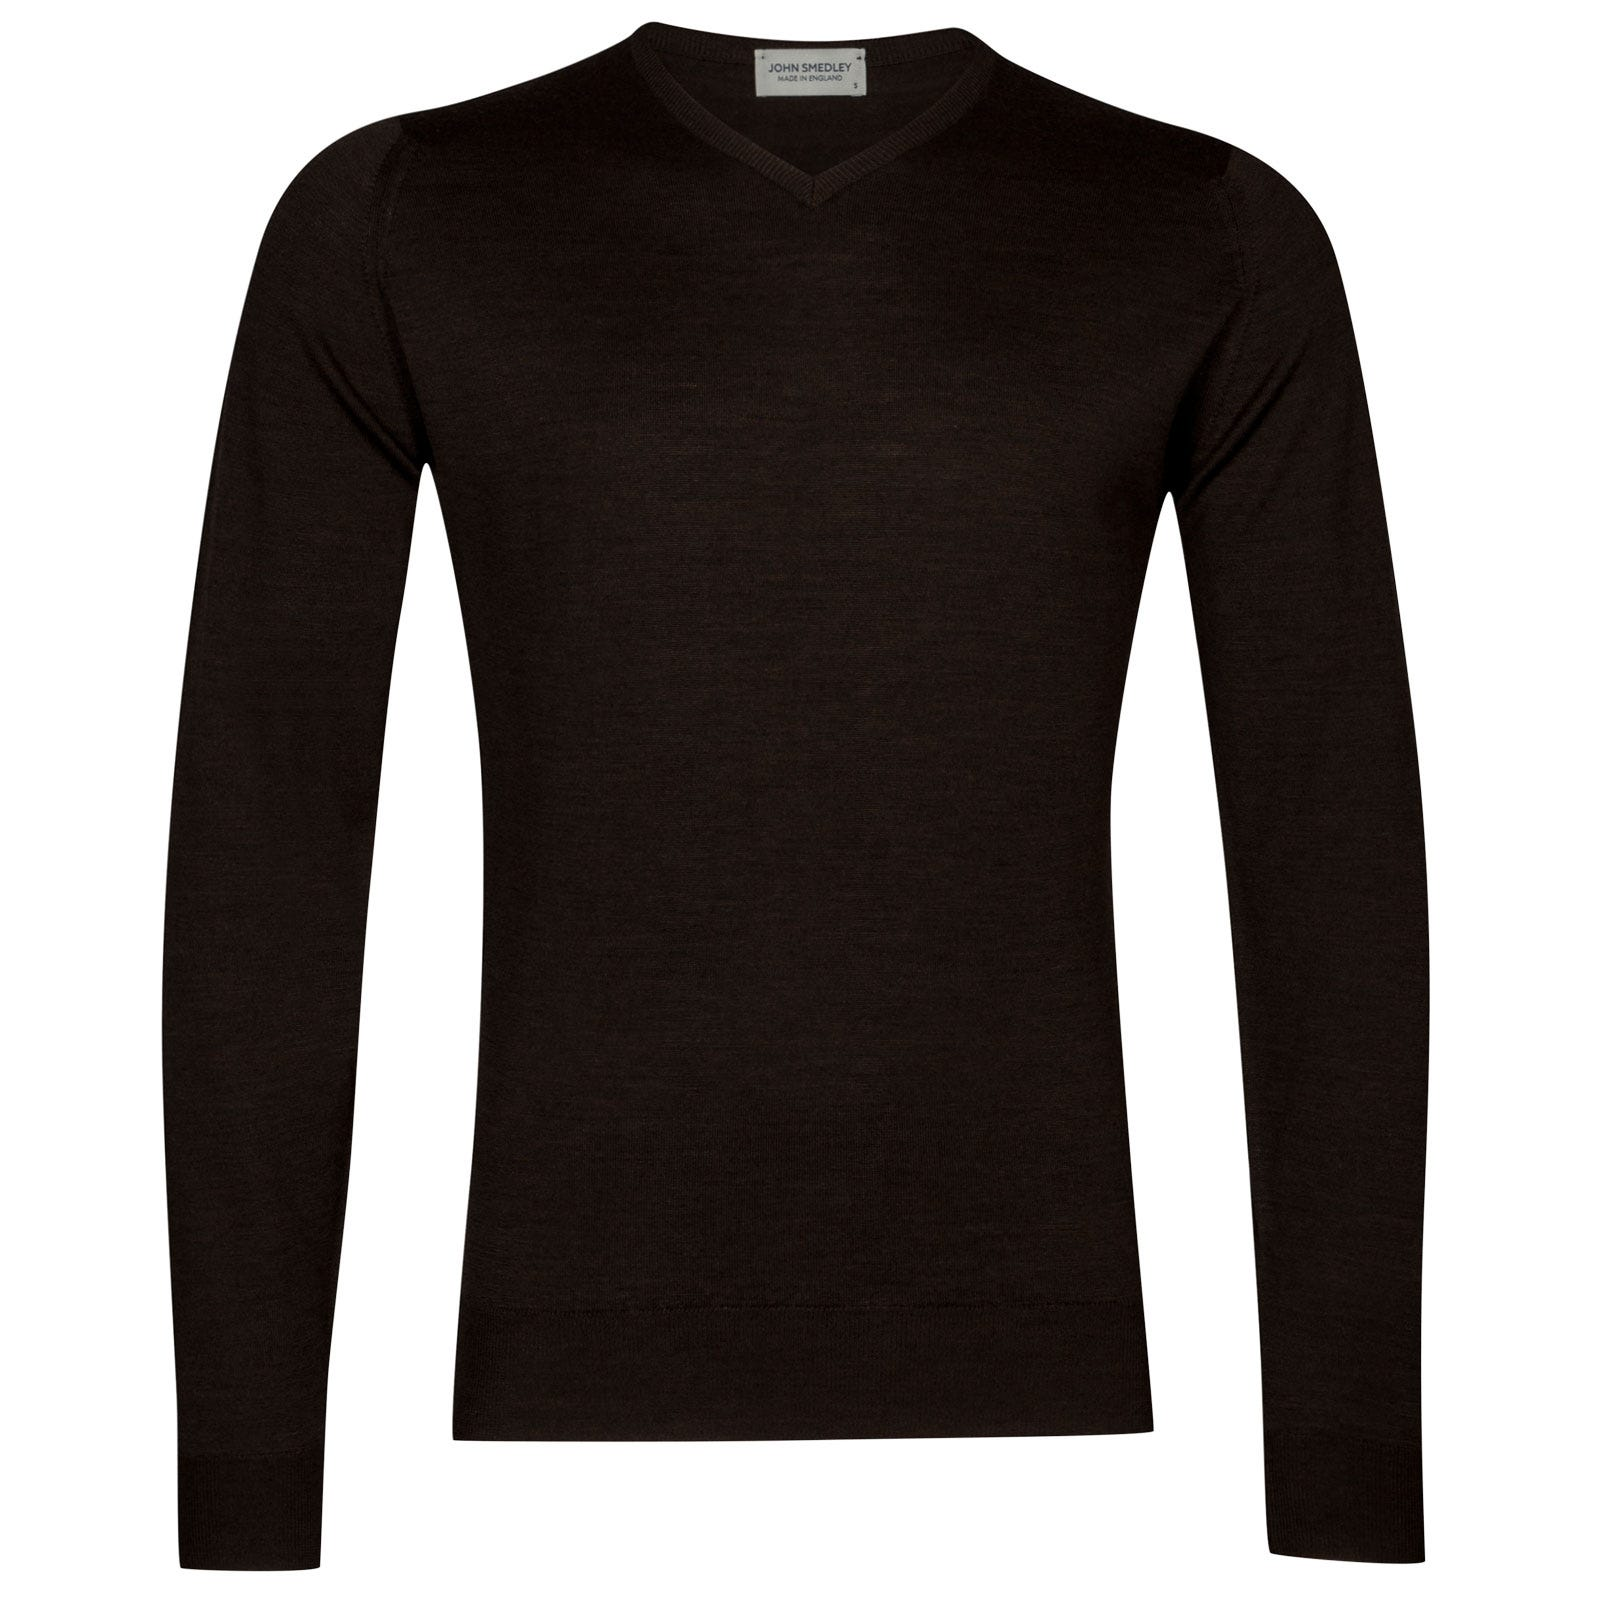 John Smedley Shipton Merino Wool Pullover in Chestnut-M